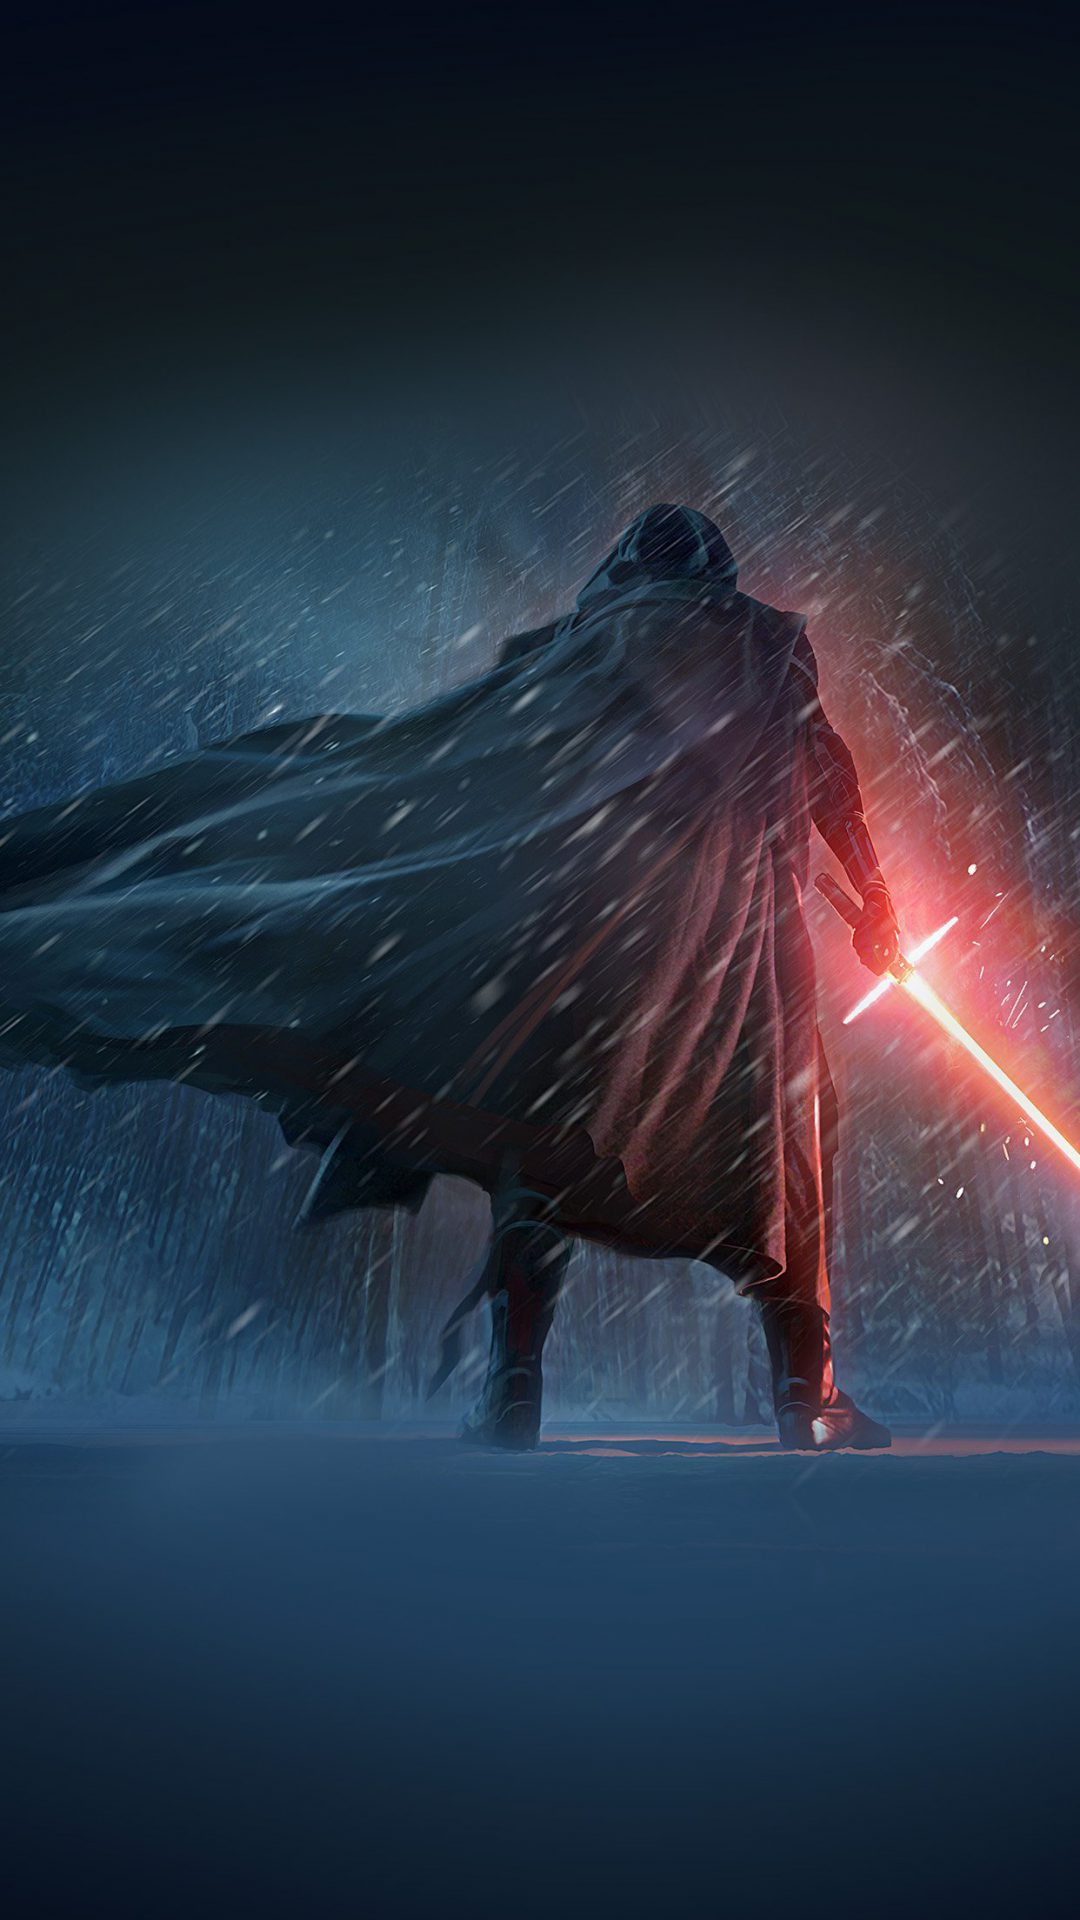 Darth Vader Starwars 7 Poster Film Art